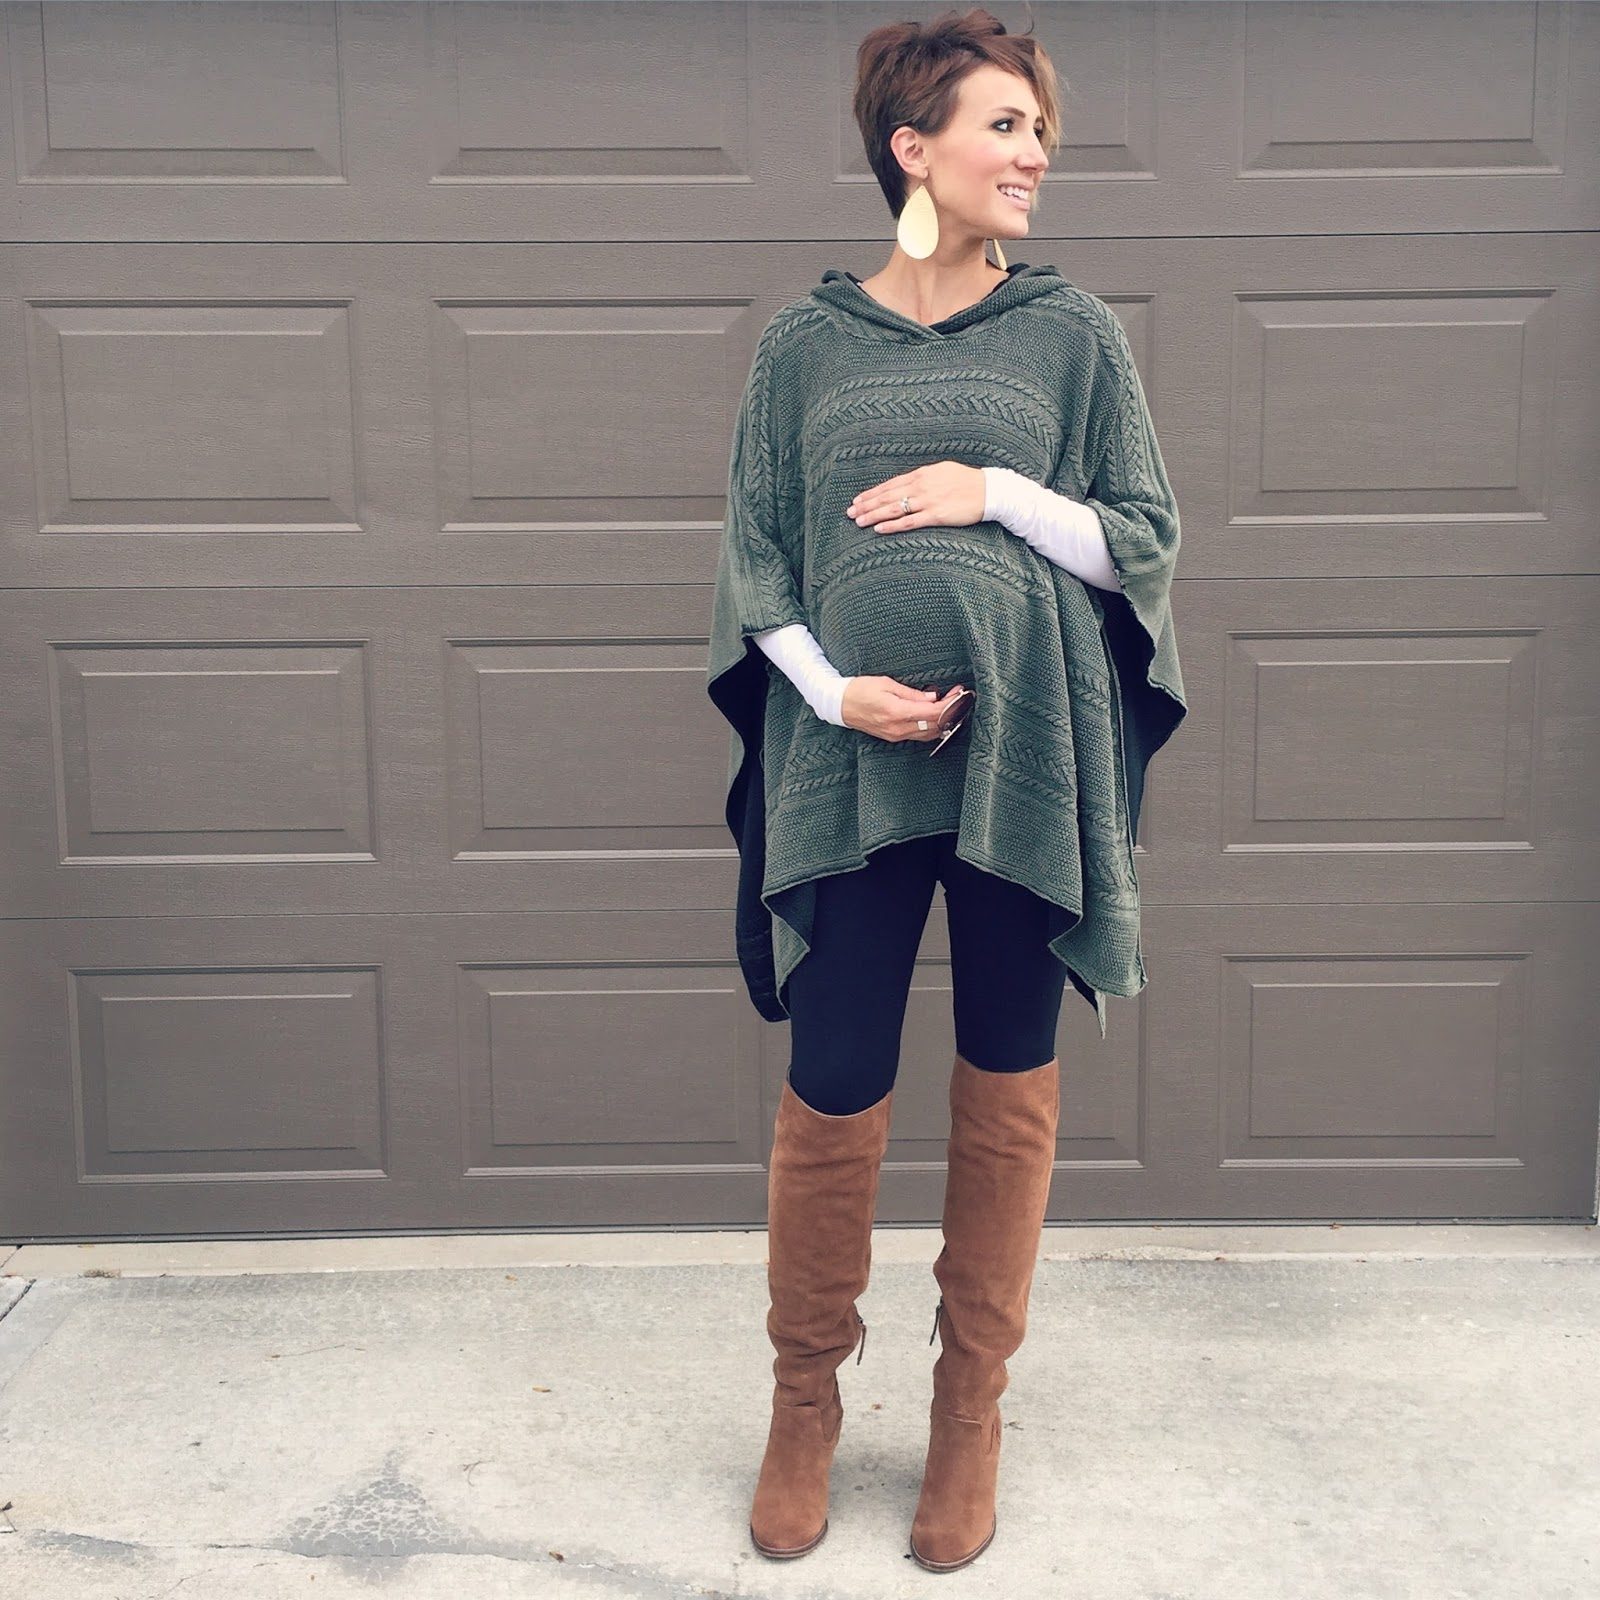 Everyday Style- November